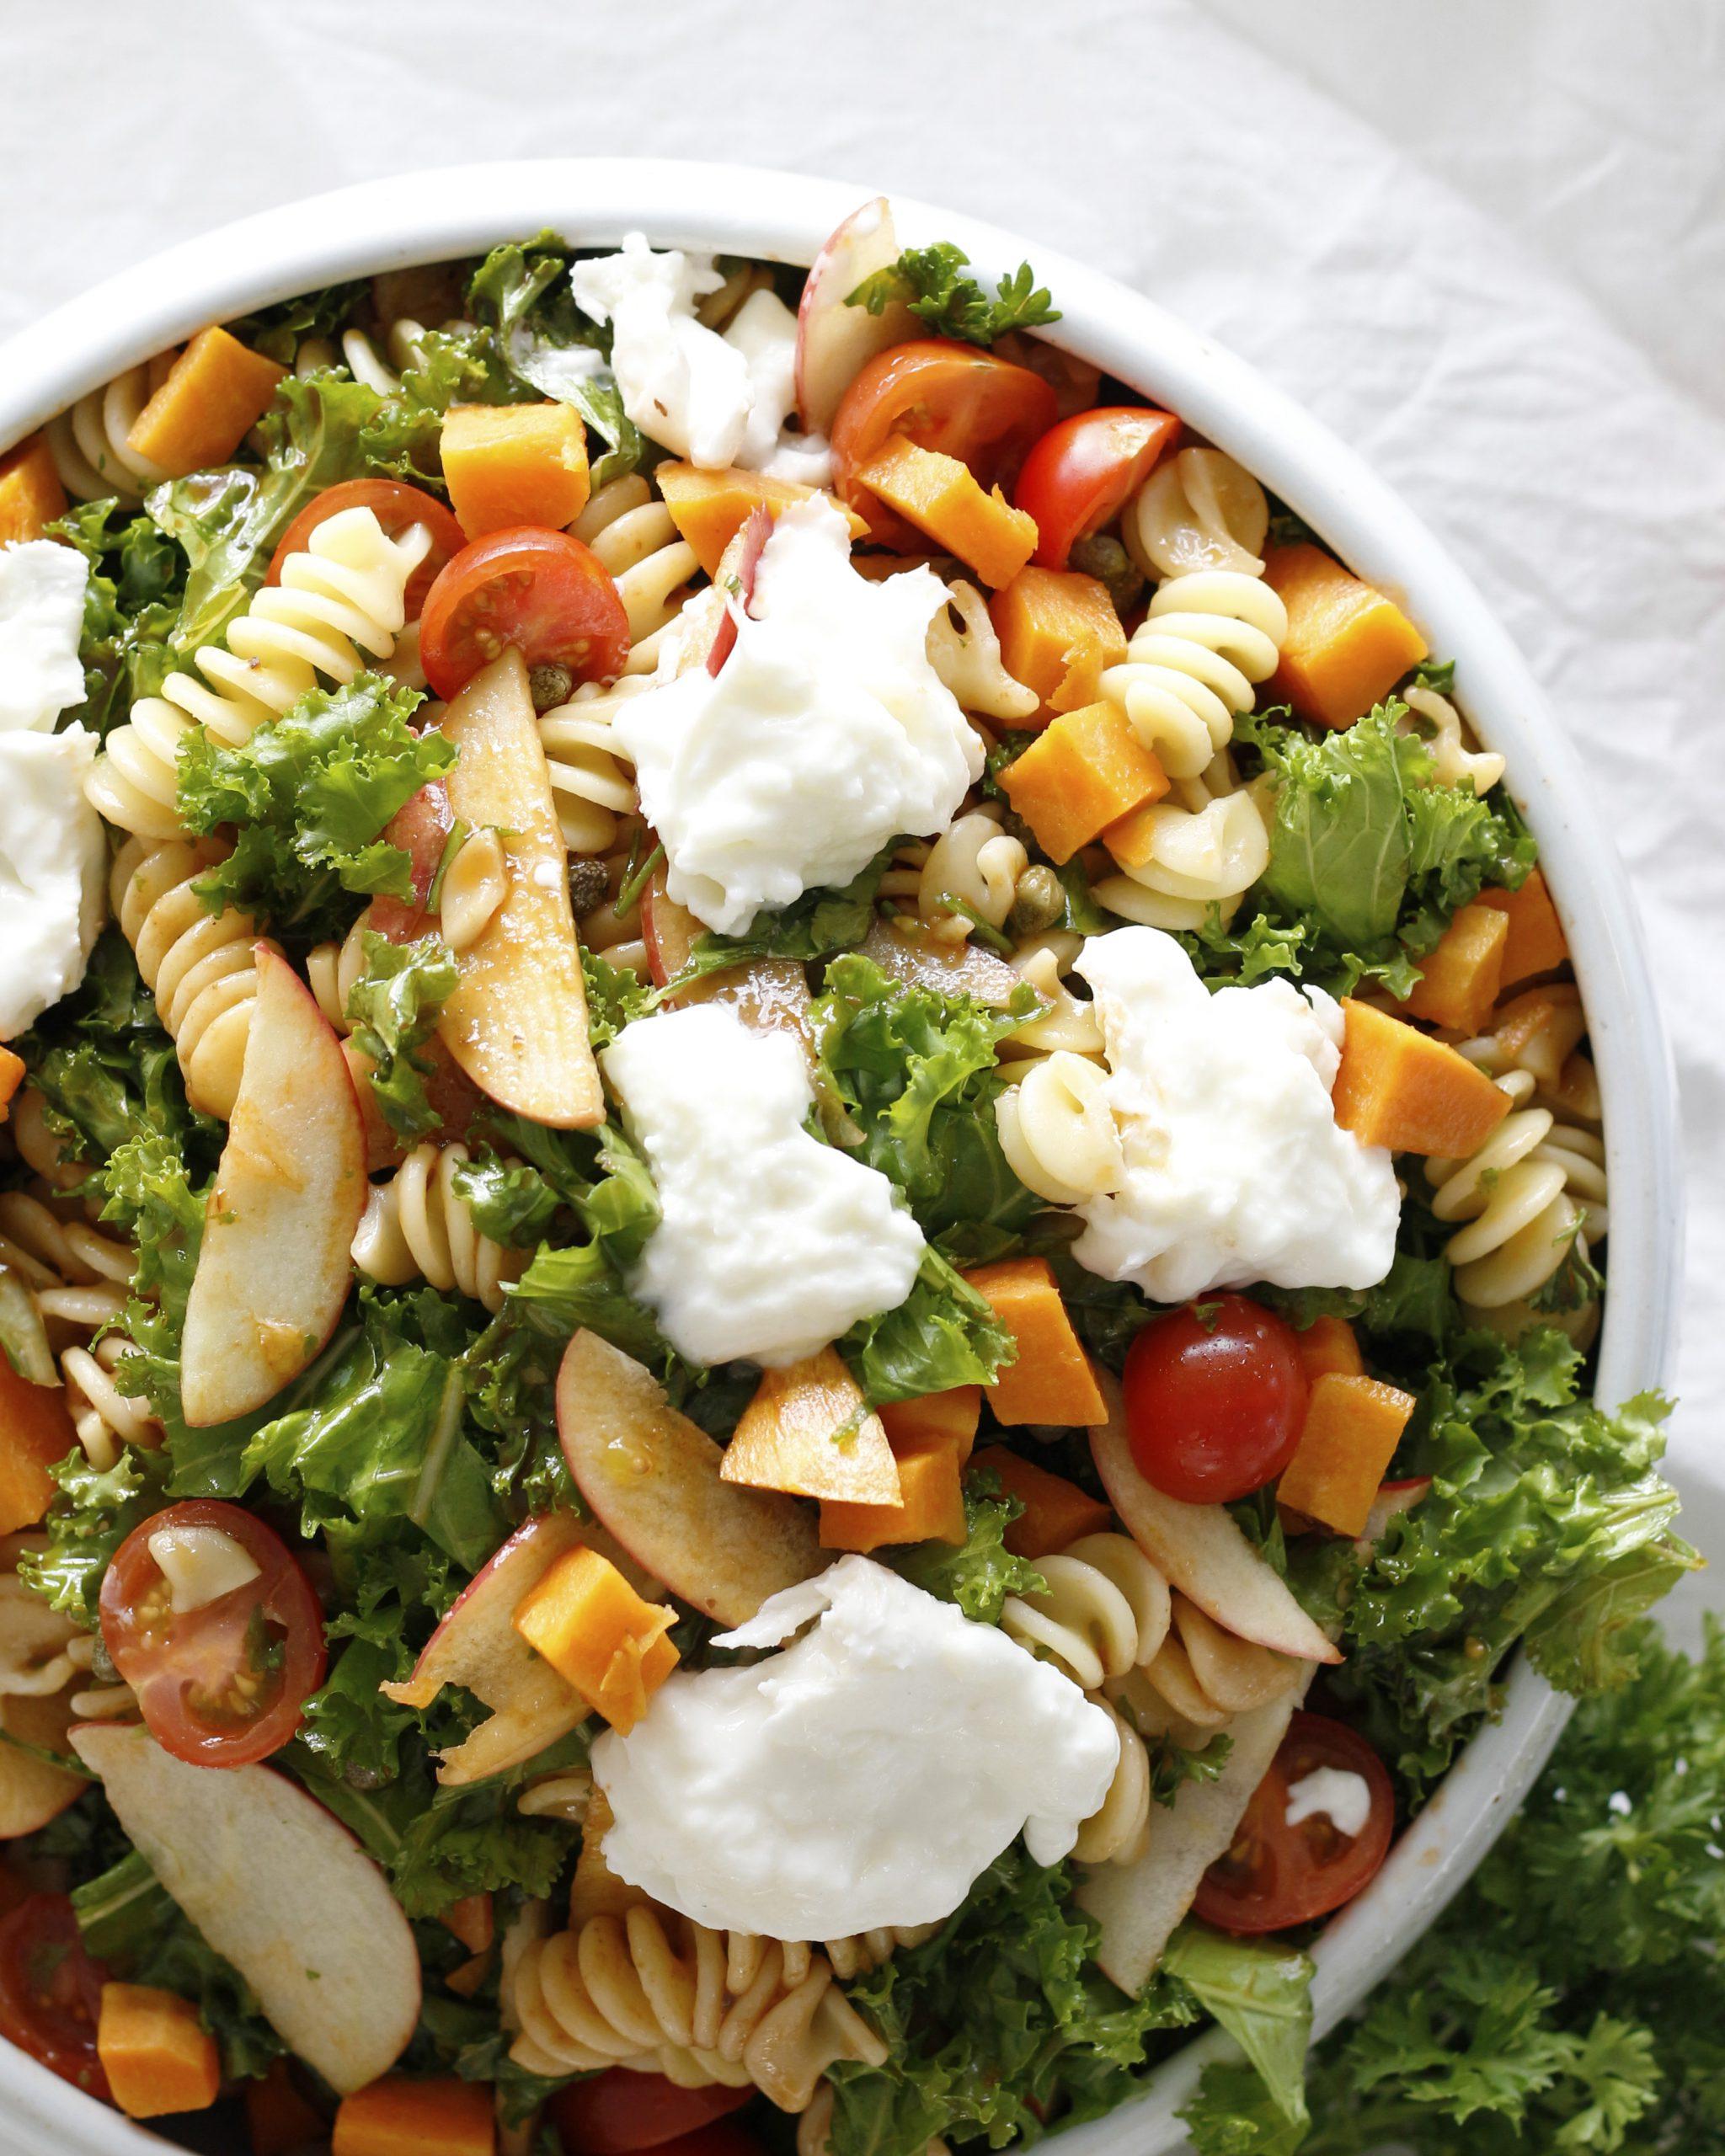 Ferskt pastasalat með eplum og ferskum mosarella